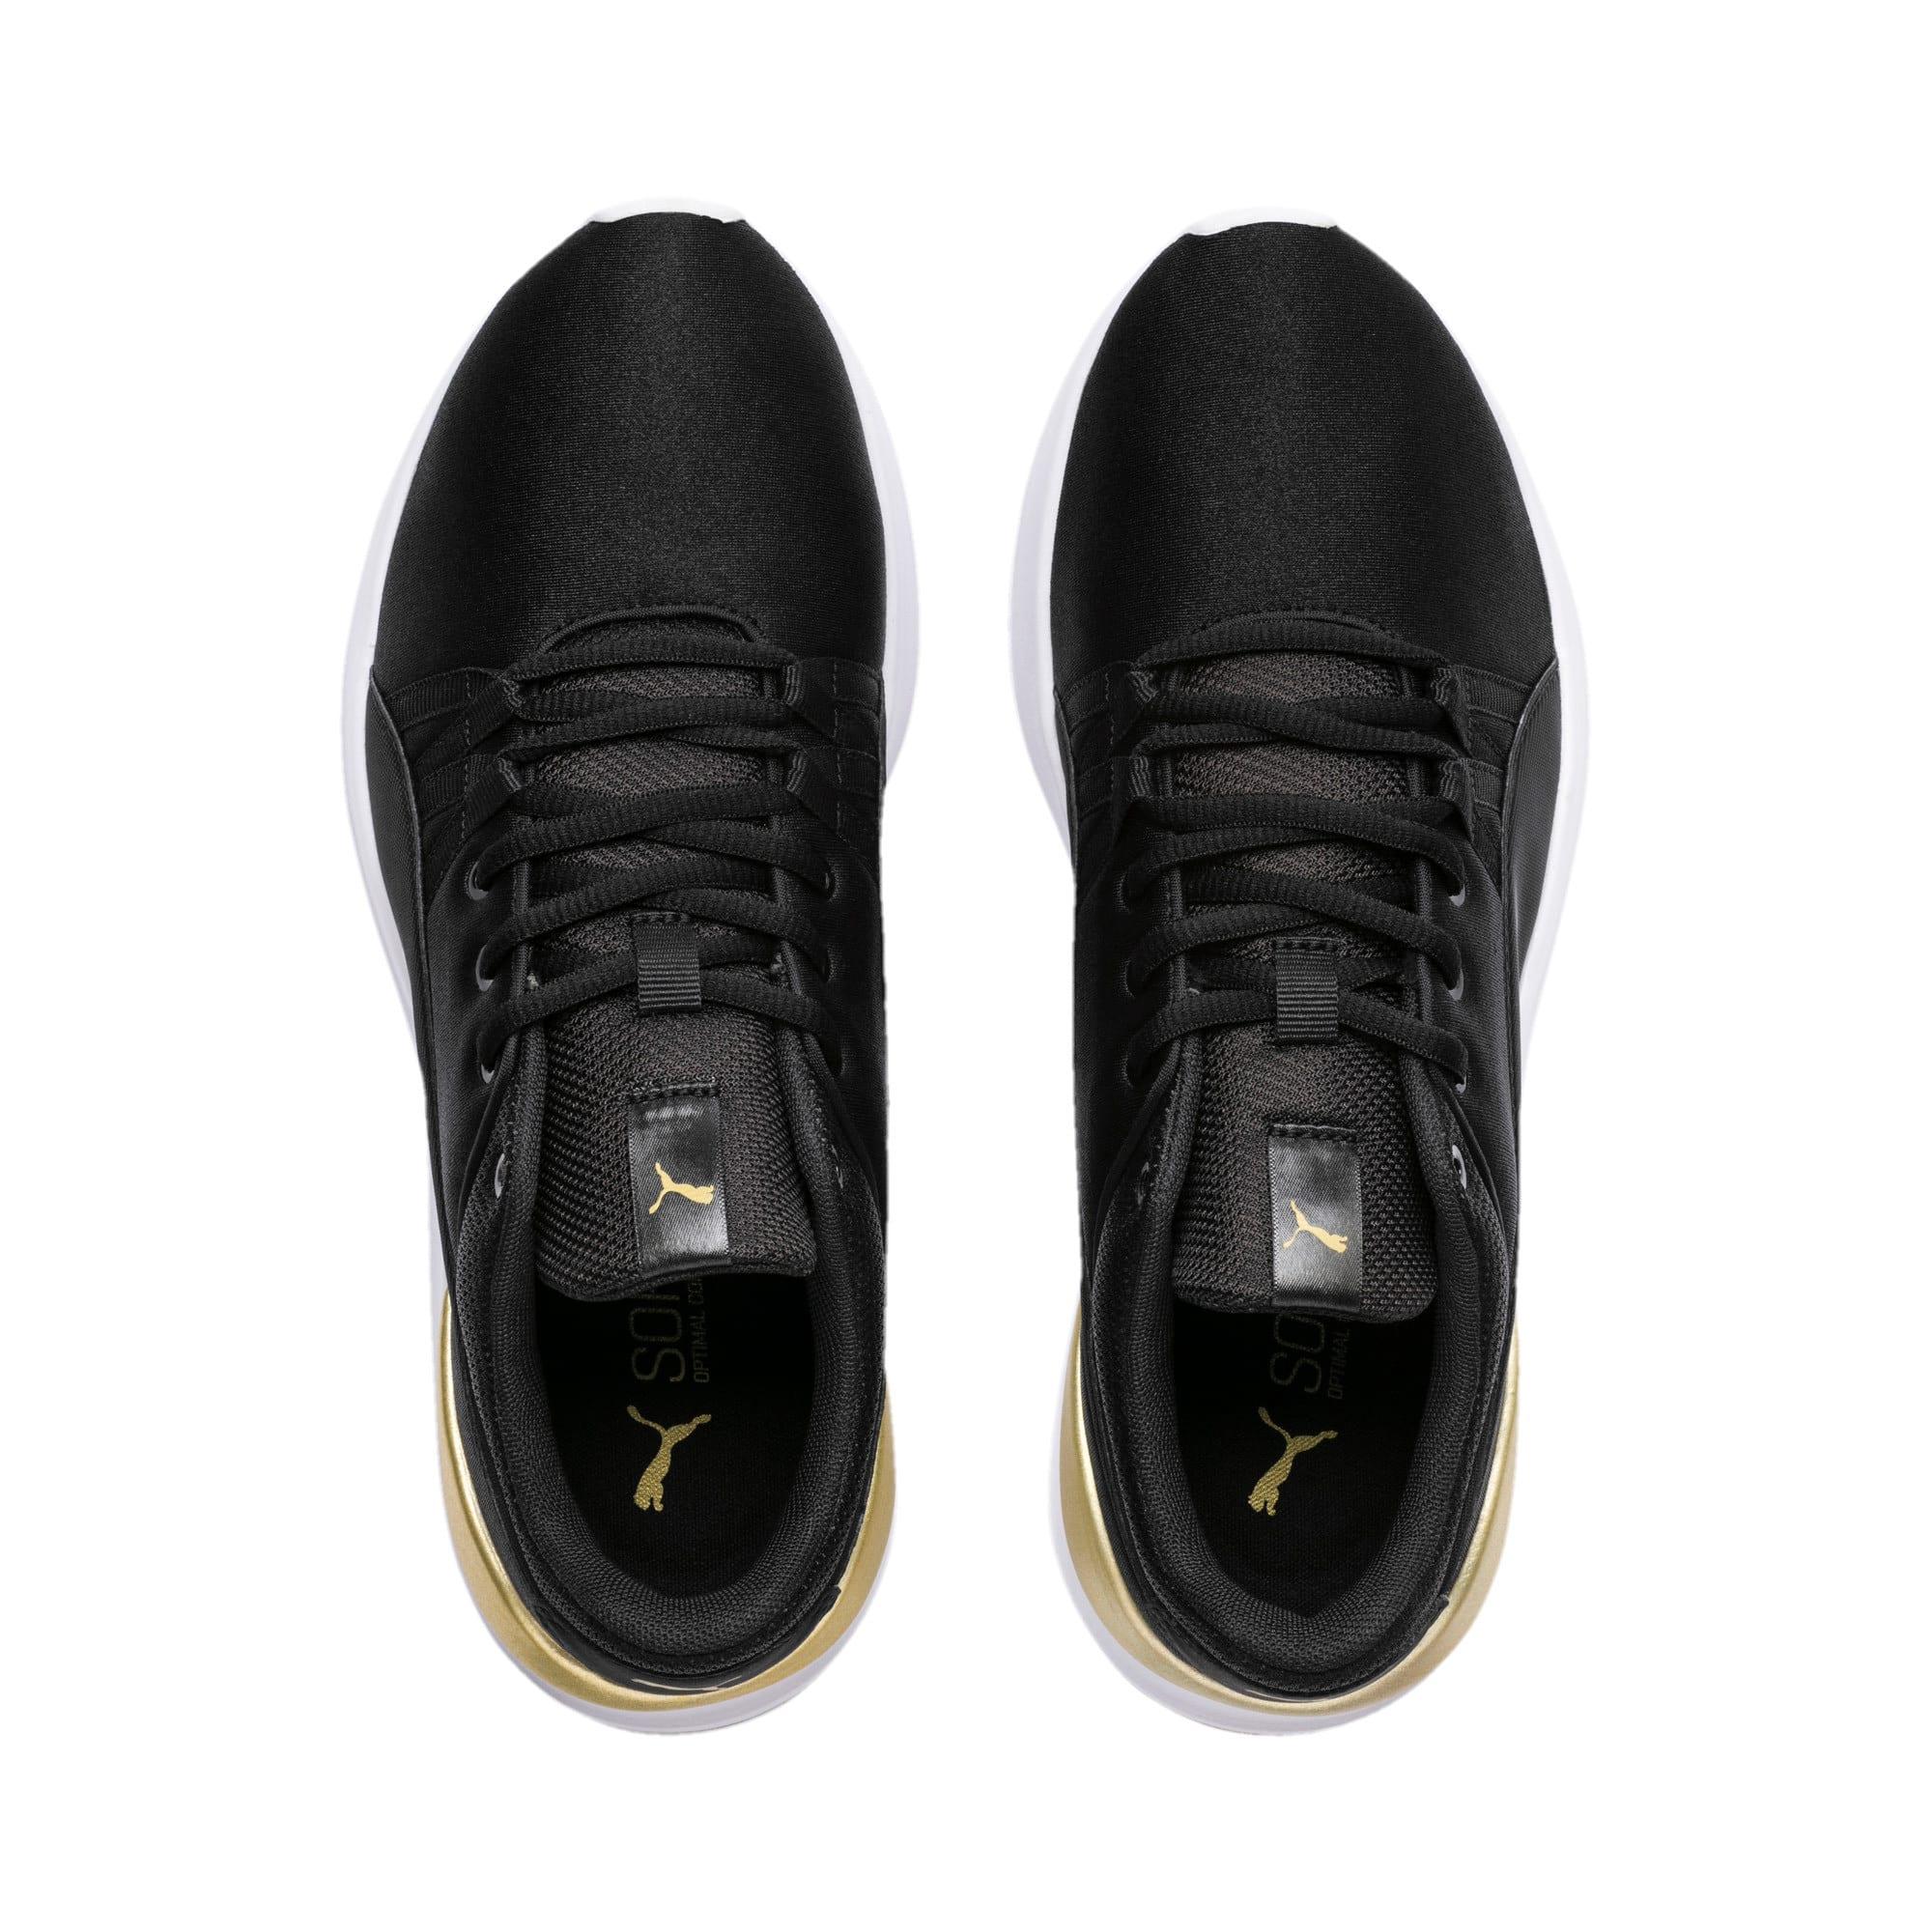 Thumbnail 6 of Adela Women's Sneakers, Puma Black - Puma Black, medium